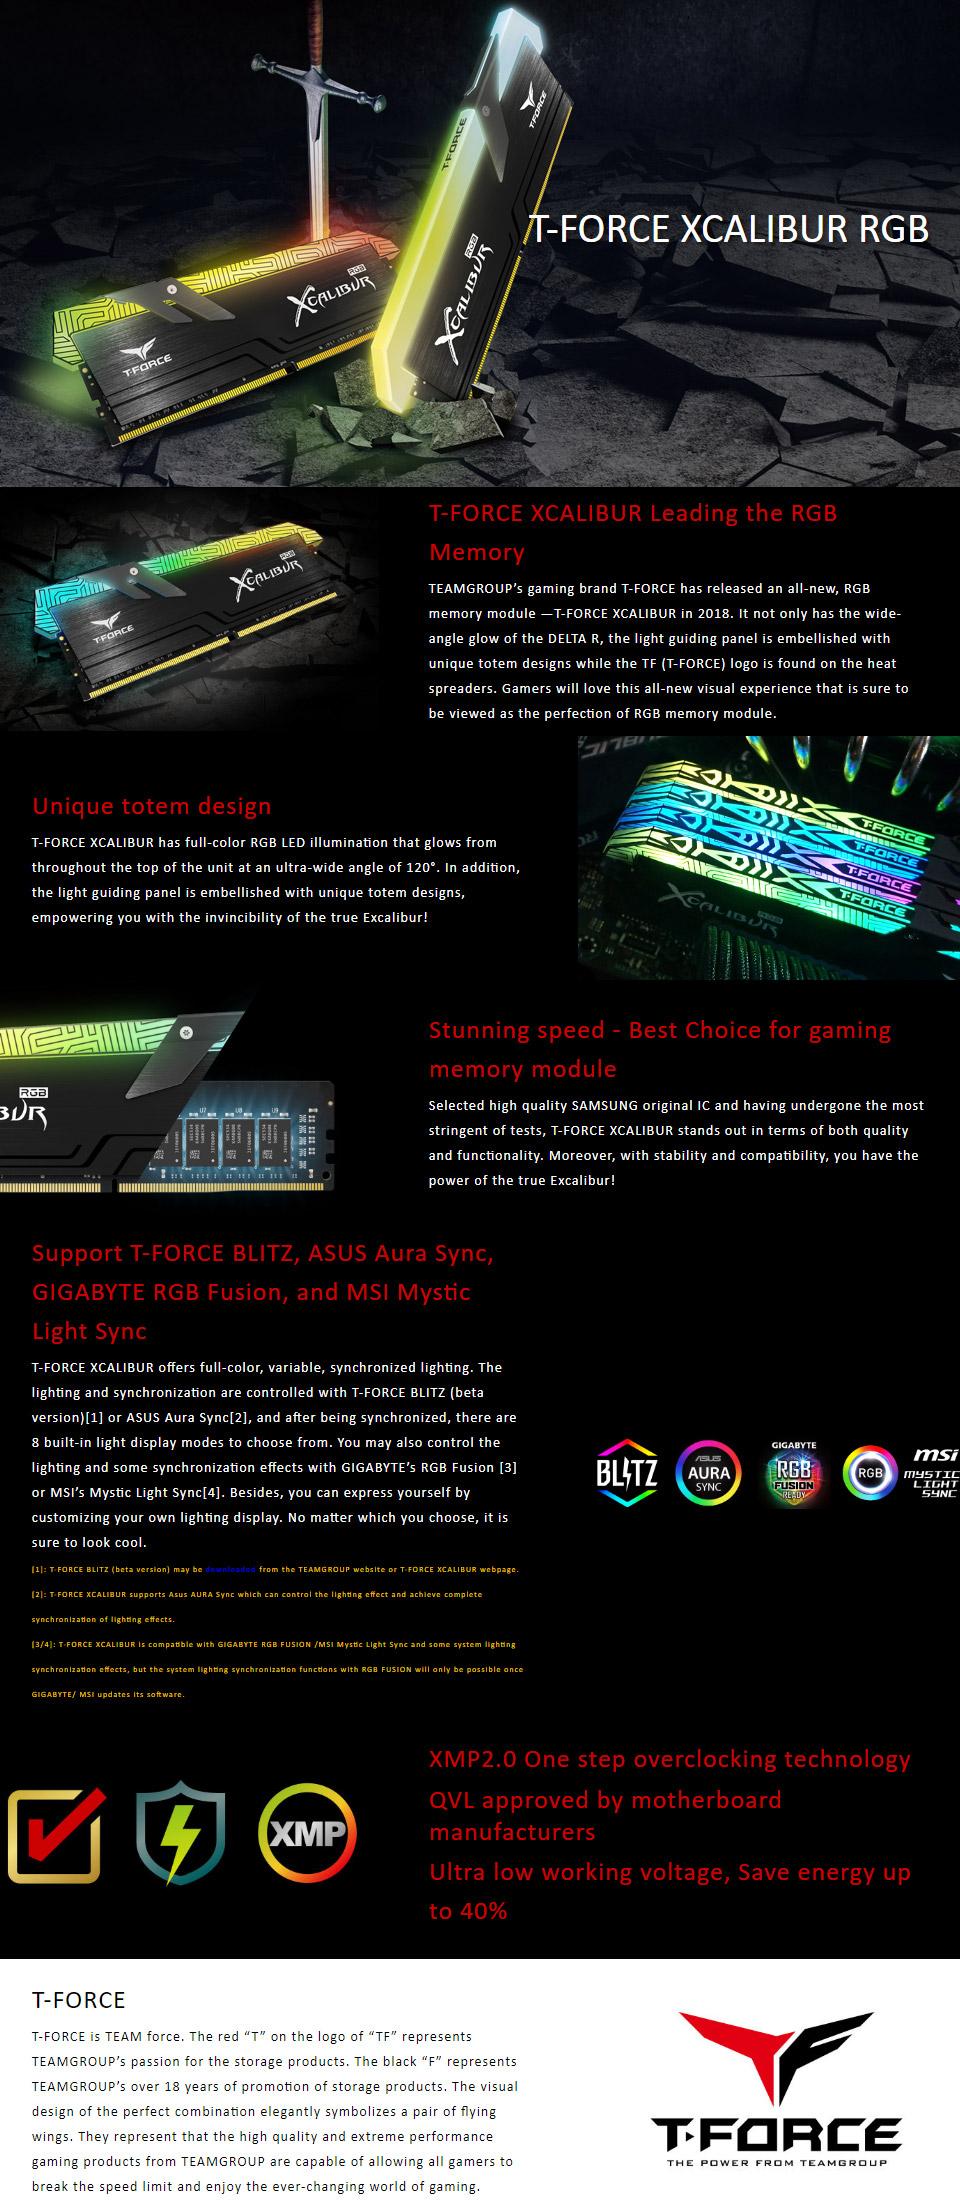 Team T-Force Xcalibur RGB 3600MHz 16GB (2x8GB) DDR4 Black